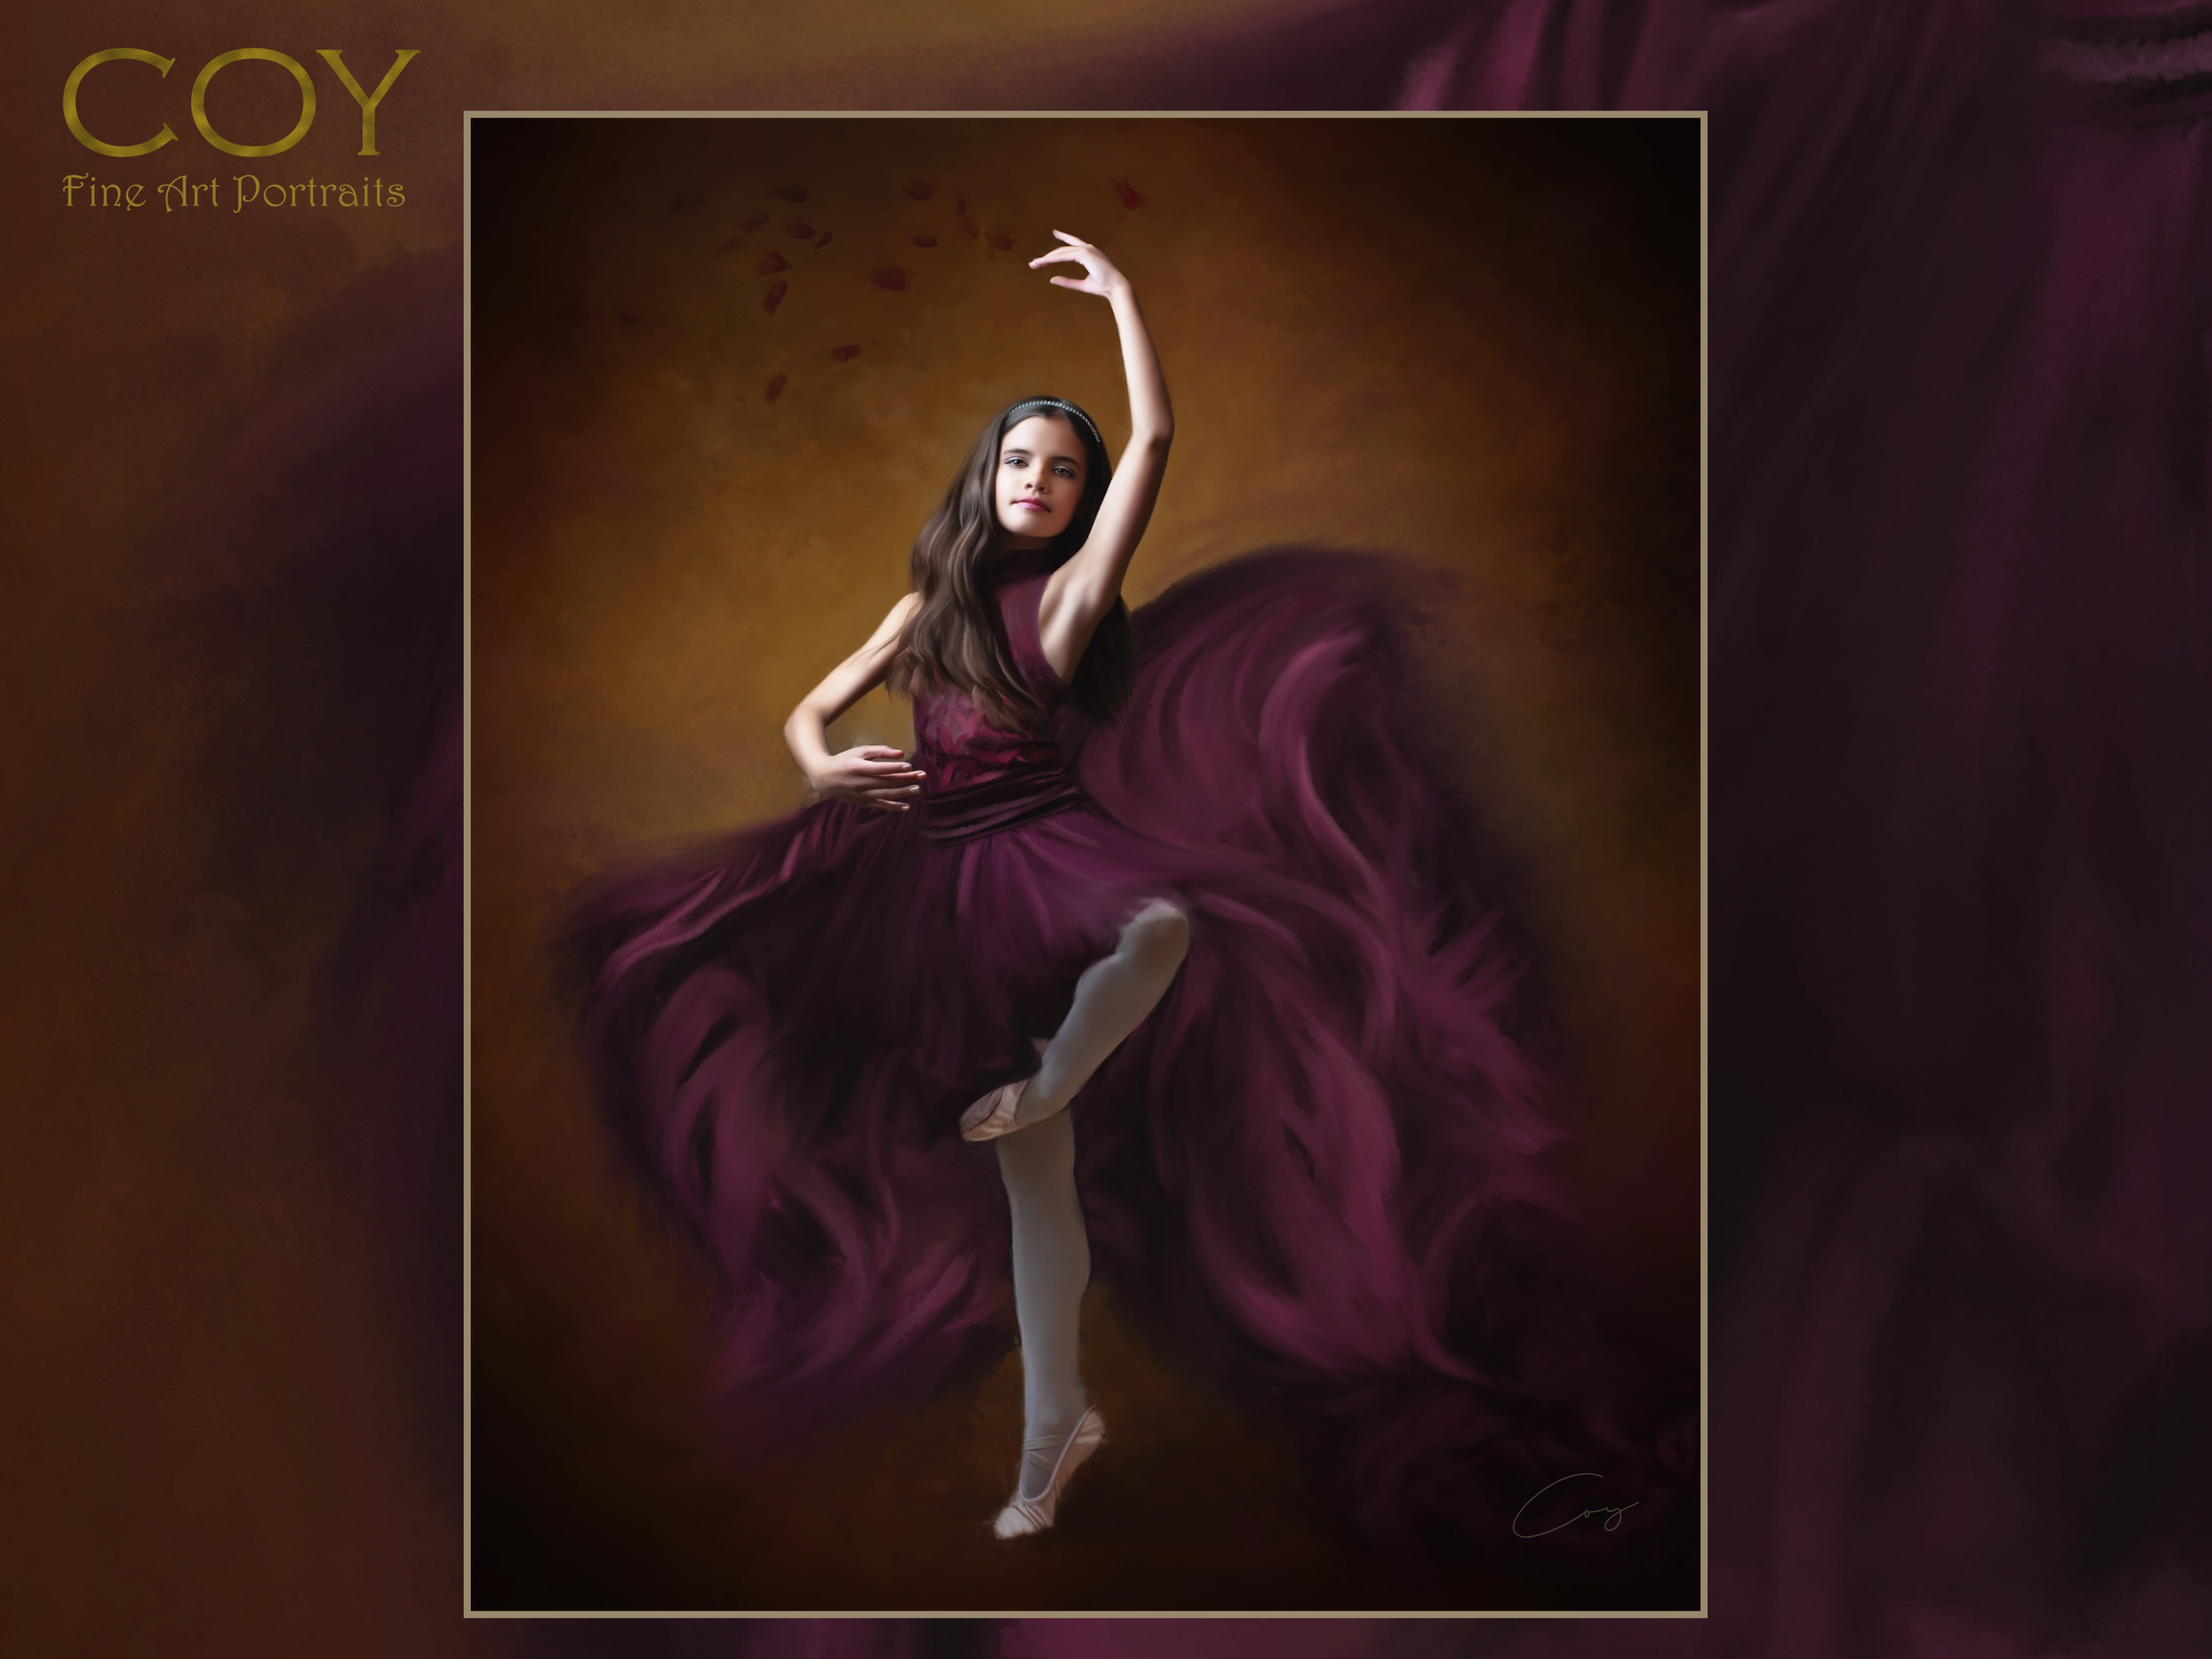 ballet-ballerina-portrait-painting-oil-rancho santa fe- san diego-la jolla-fairbanks ranch-inspired movement dance- 4s ranch.jpg